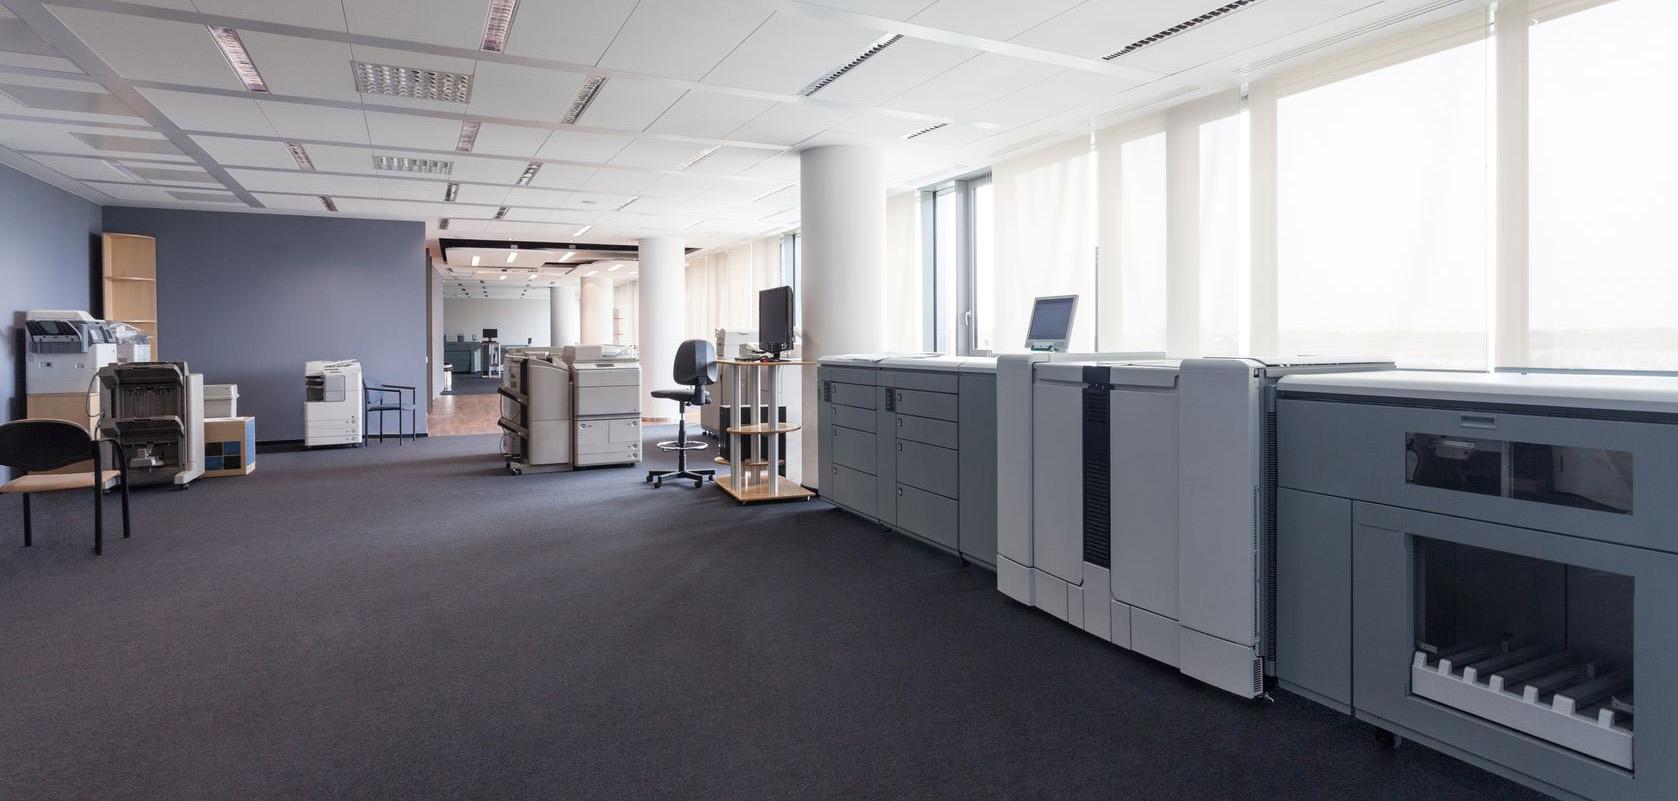 Printing appliances